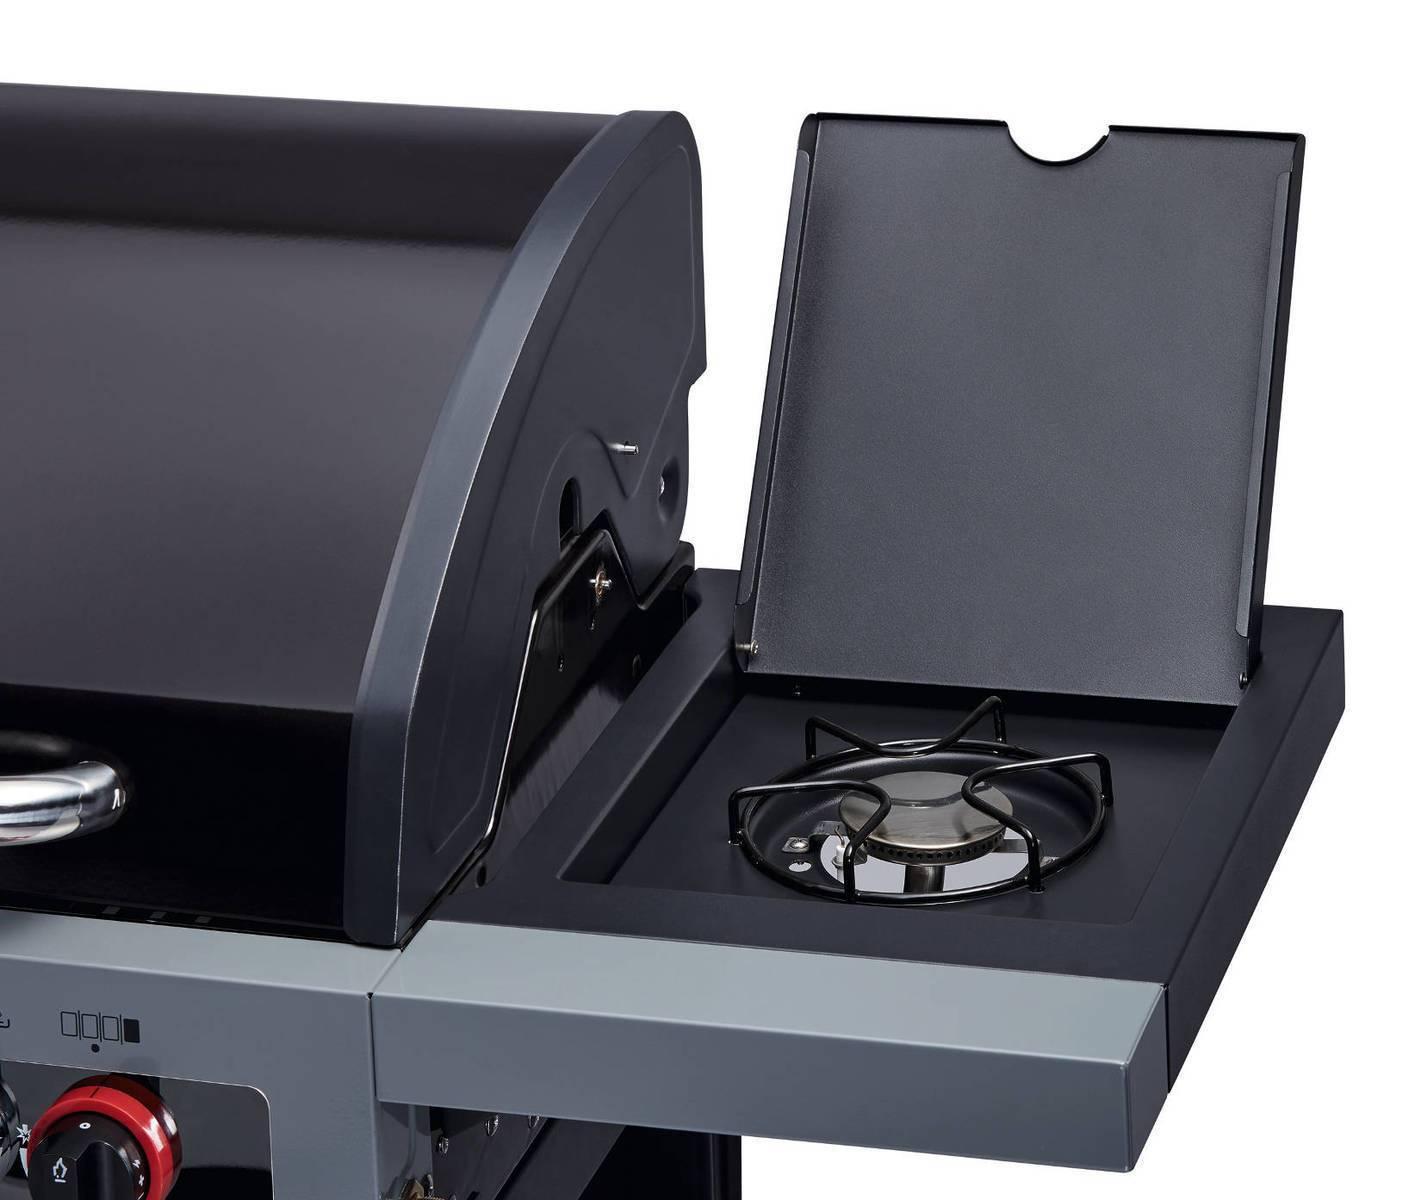 enders gasgrill boston 4 ik black 21 15 kw infrarotbrenner seitenkocher ebay. Black Bedroom Furniture Sets. Home Design Ideas